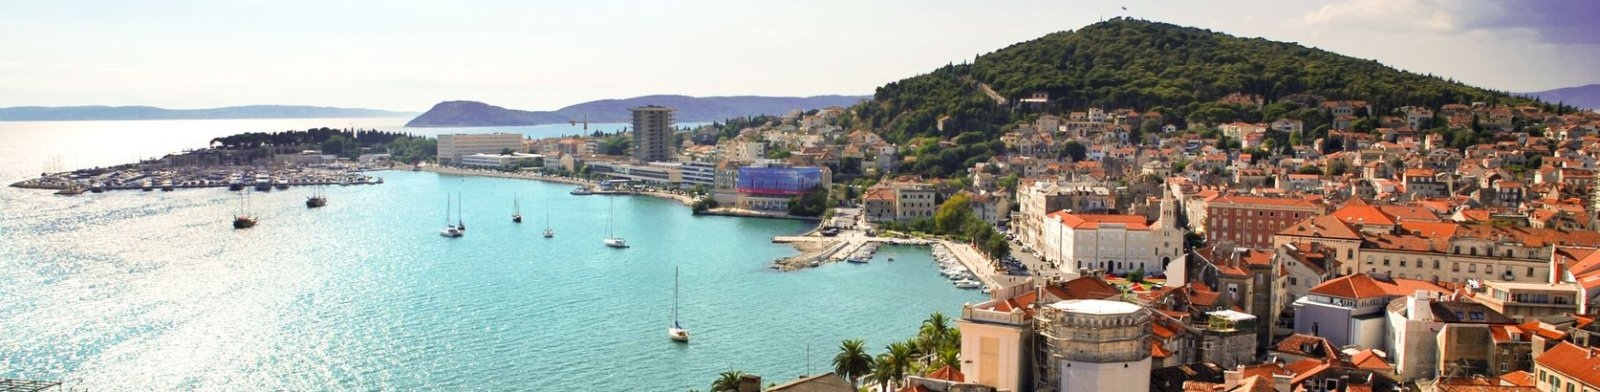 Split coastline